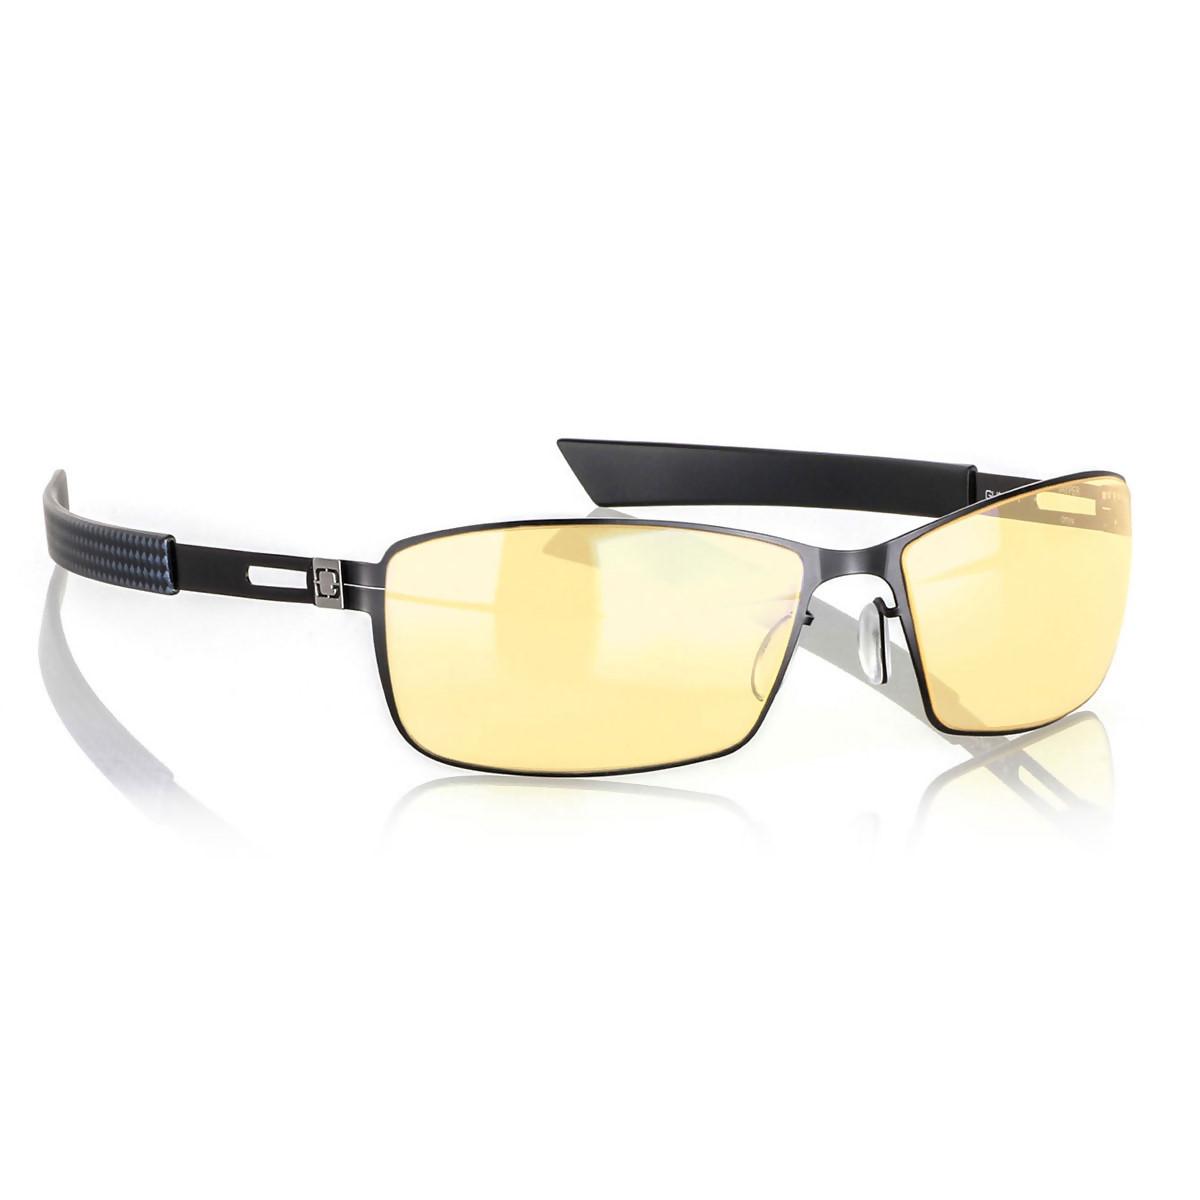 63e0f57e98aa64 Gunnar Vayper Onix   on a testé les lunettes anti-fatigue des pro-gamers